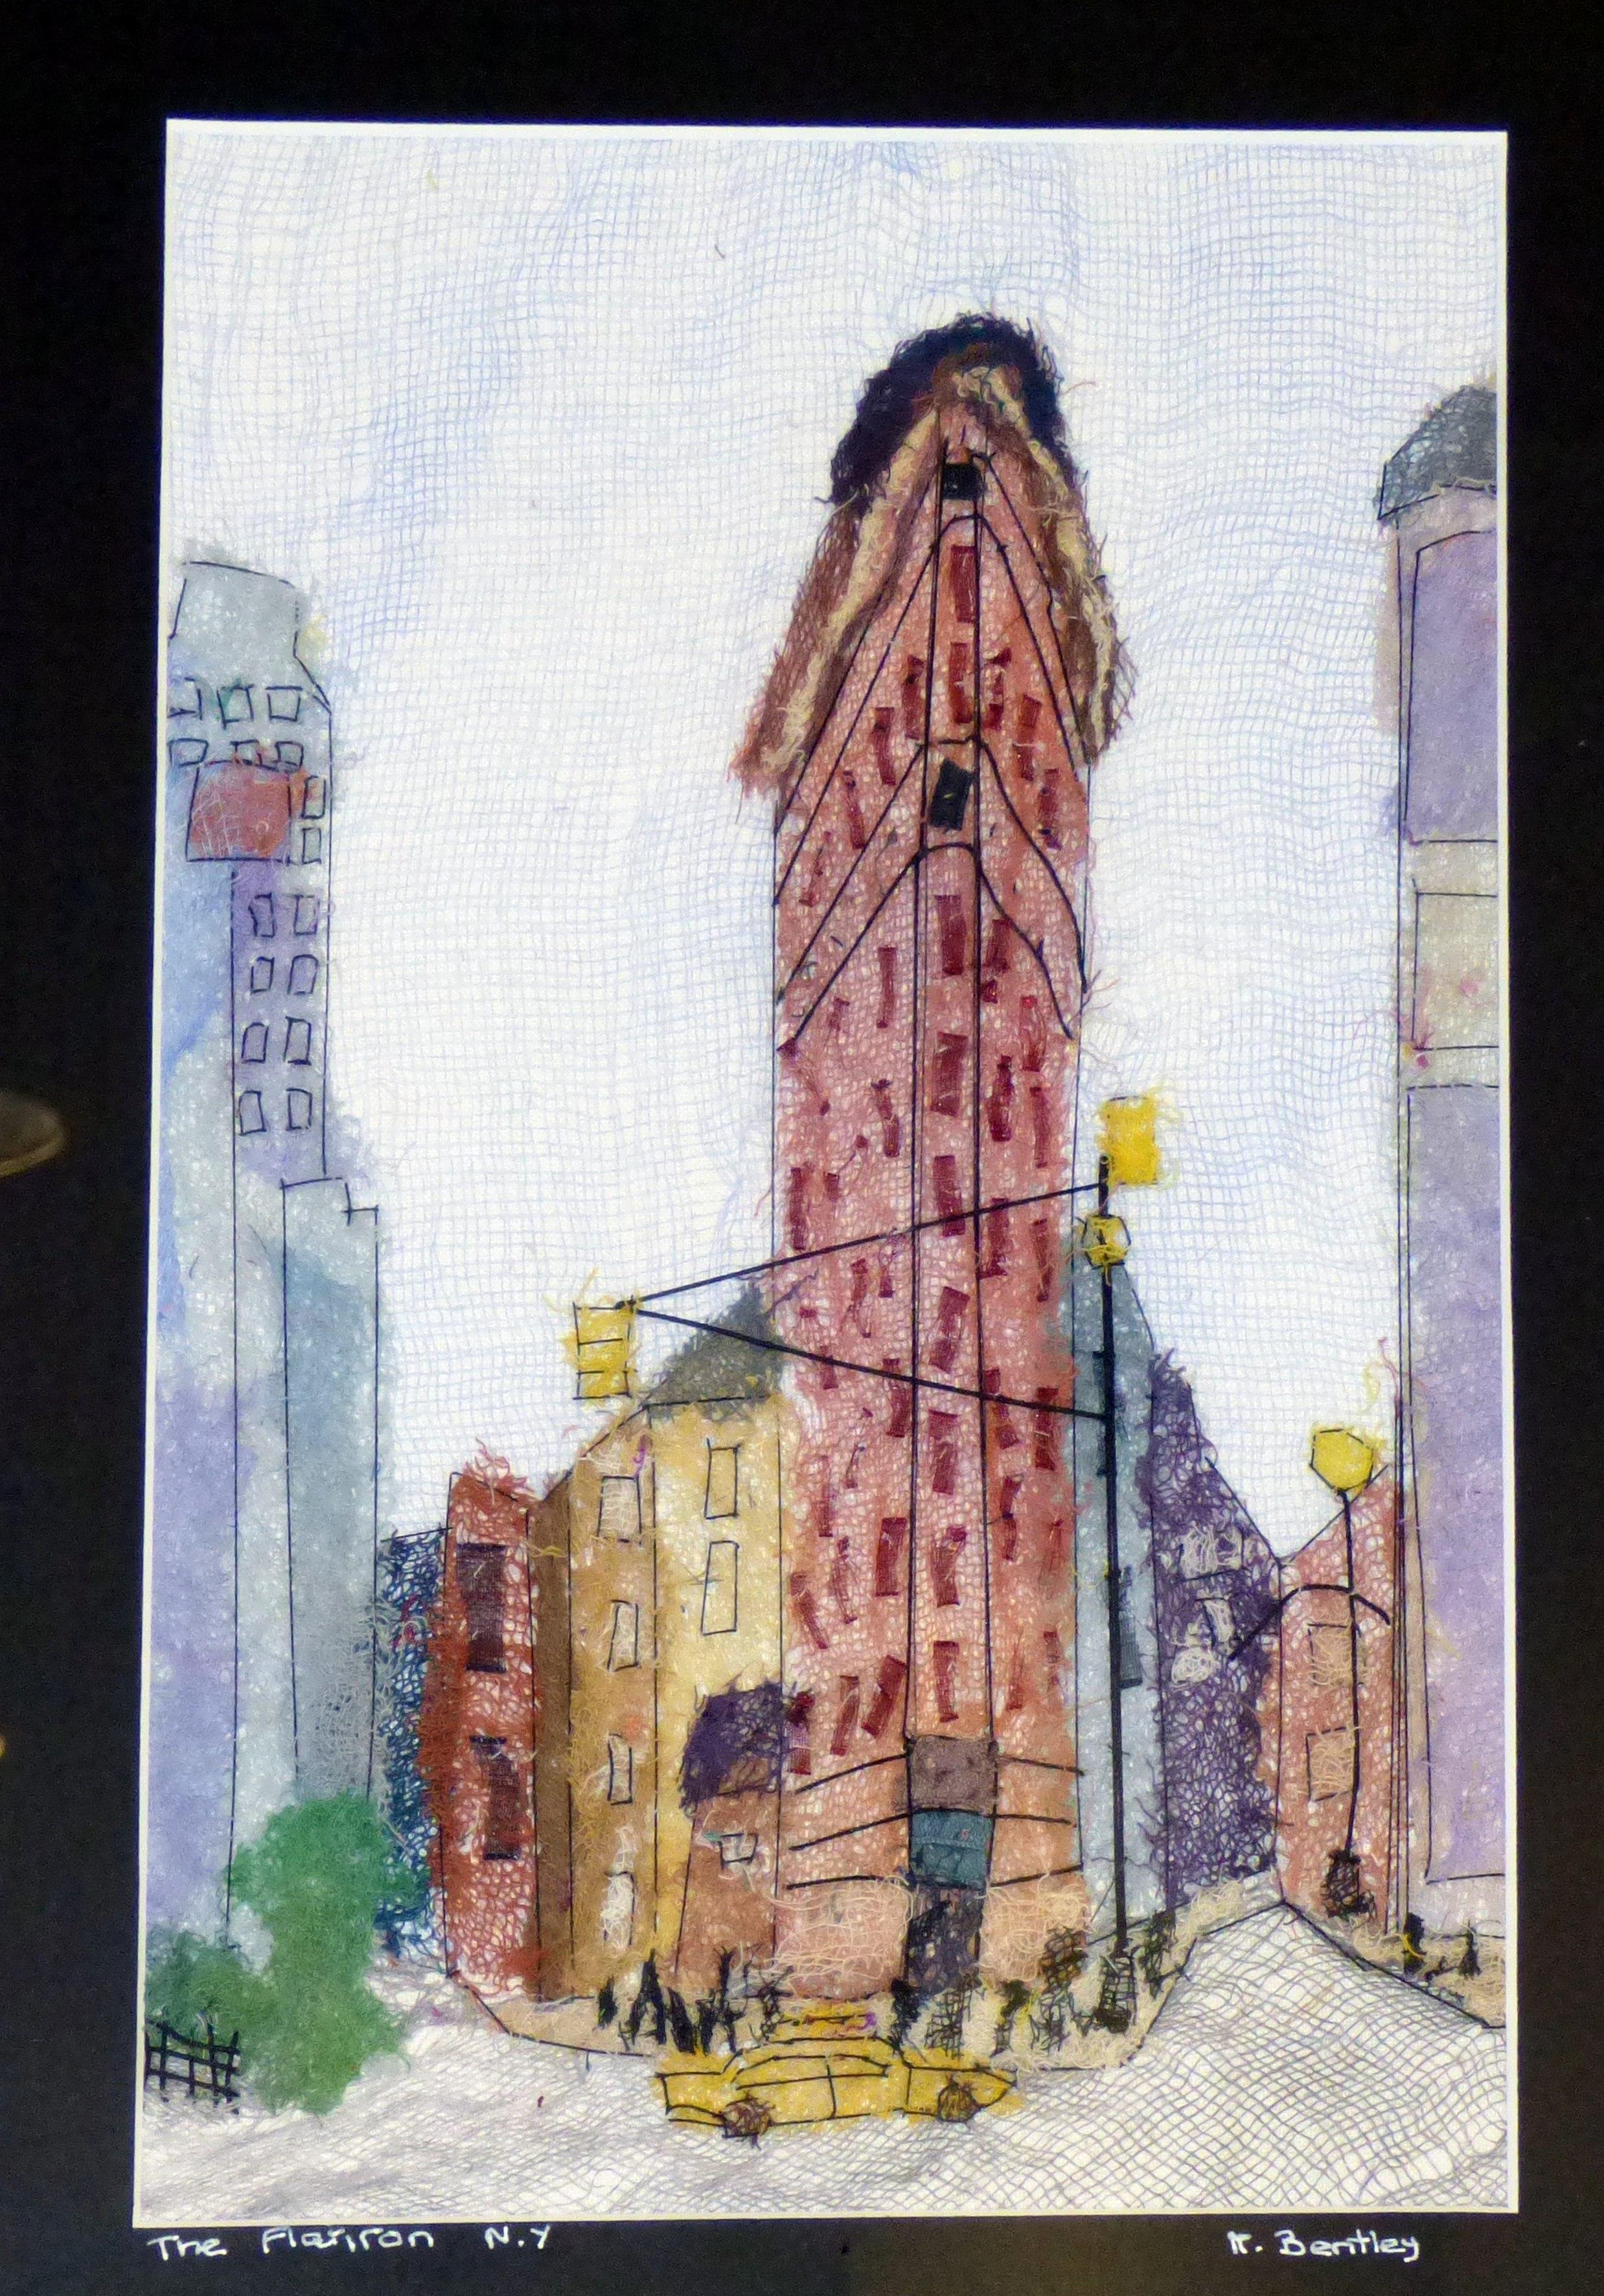 THE FLATIRON, NEW YORK by Mavis Bentley, hand embroidery in scrim & silk thread, Ten plus @ The Atkinson, 2018